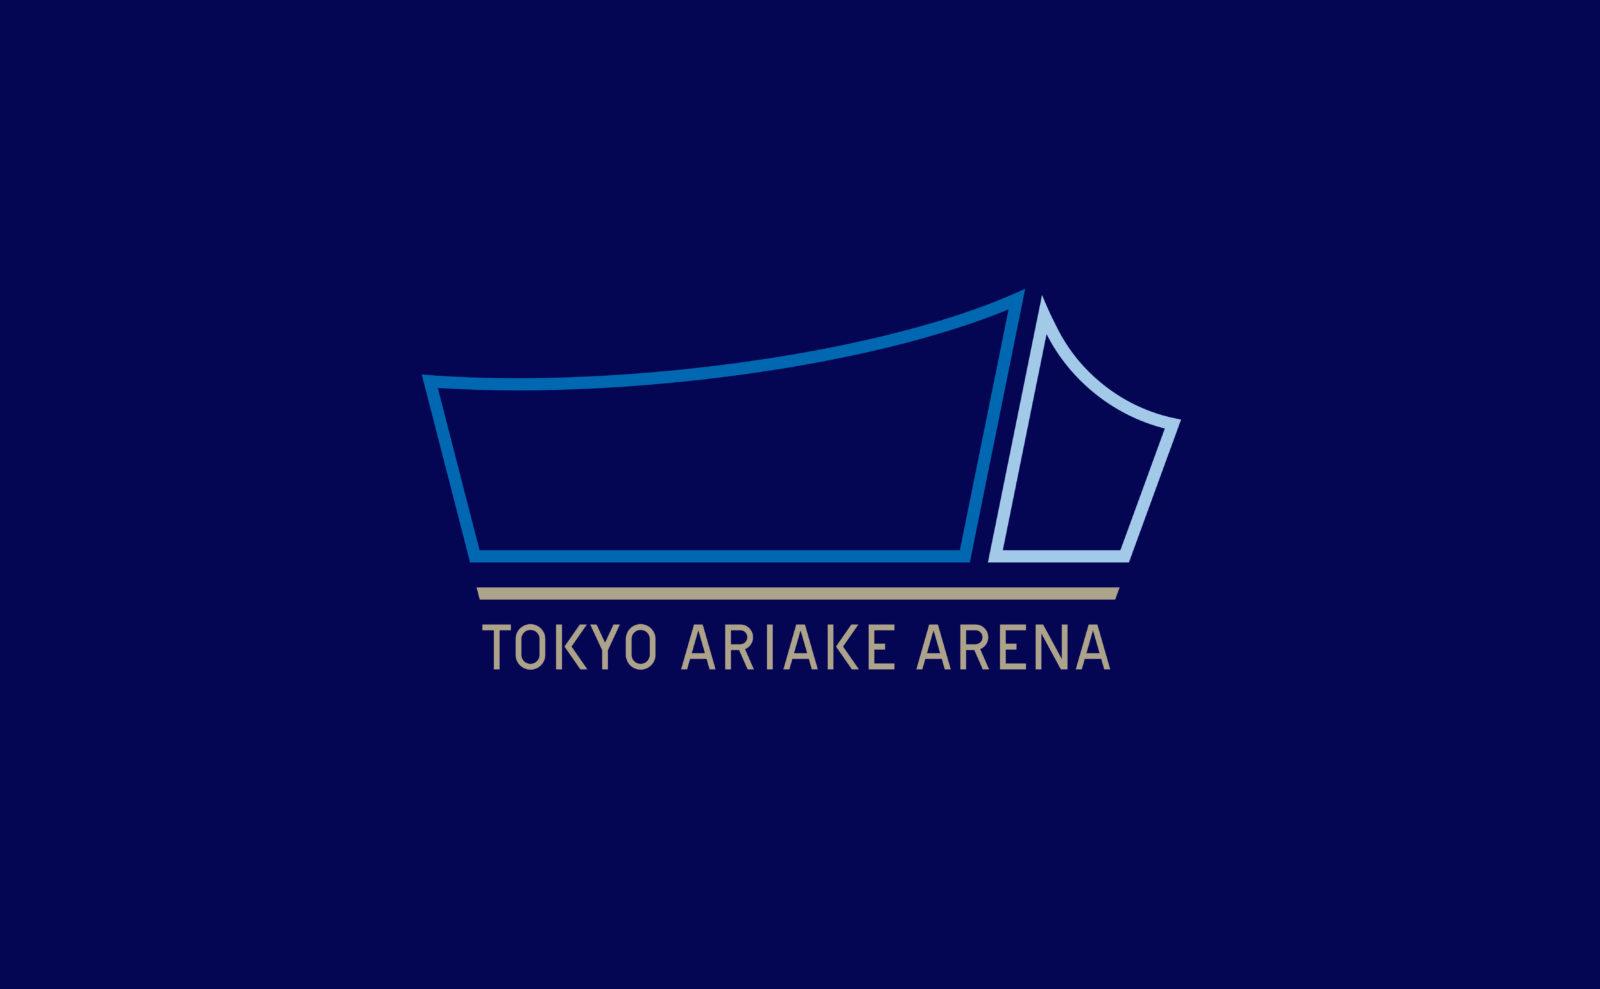 TOKYO ARIAKE ARENA__-1